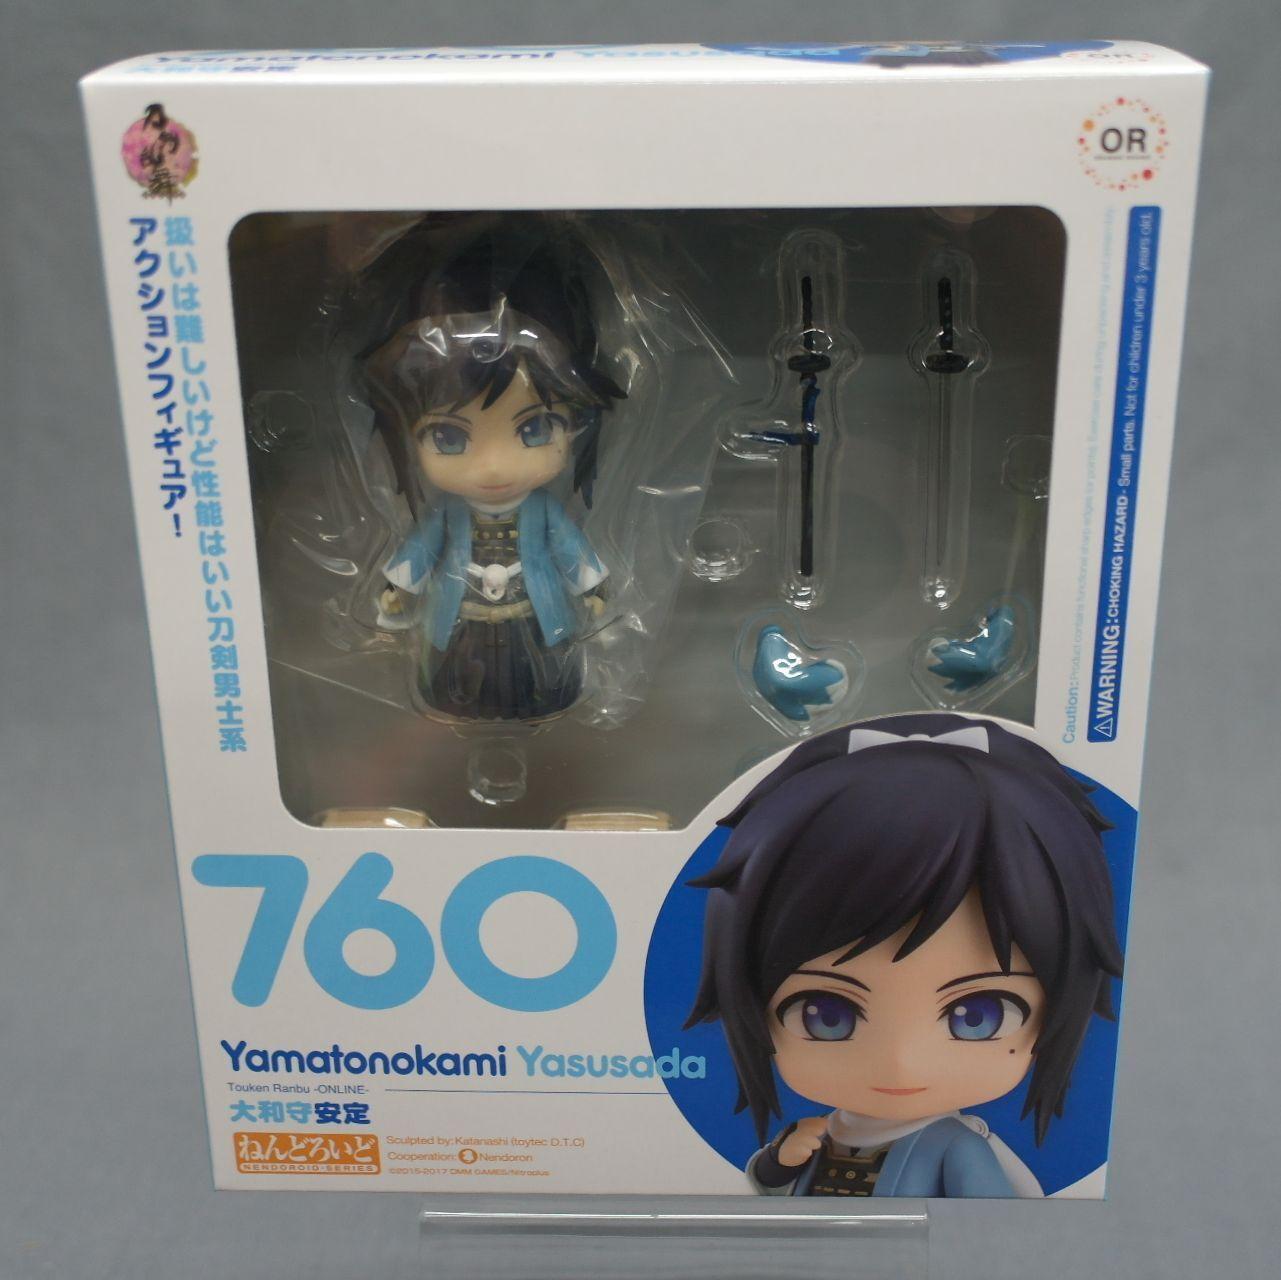 Nendoroid Touken Ranbu Online Yamato no Kami Yasusada Good Smile Company